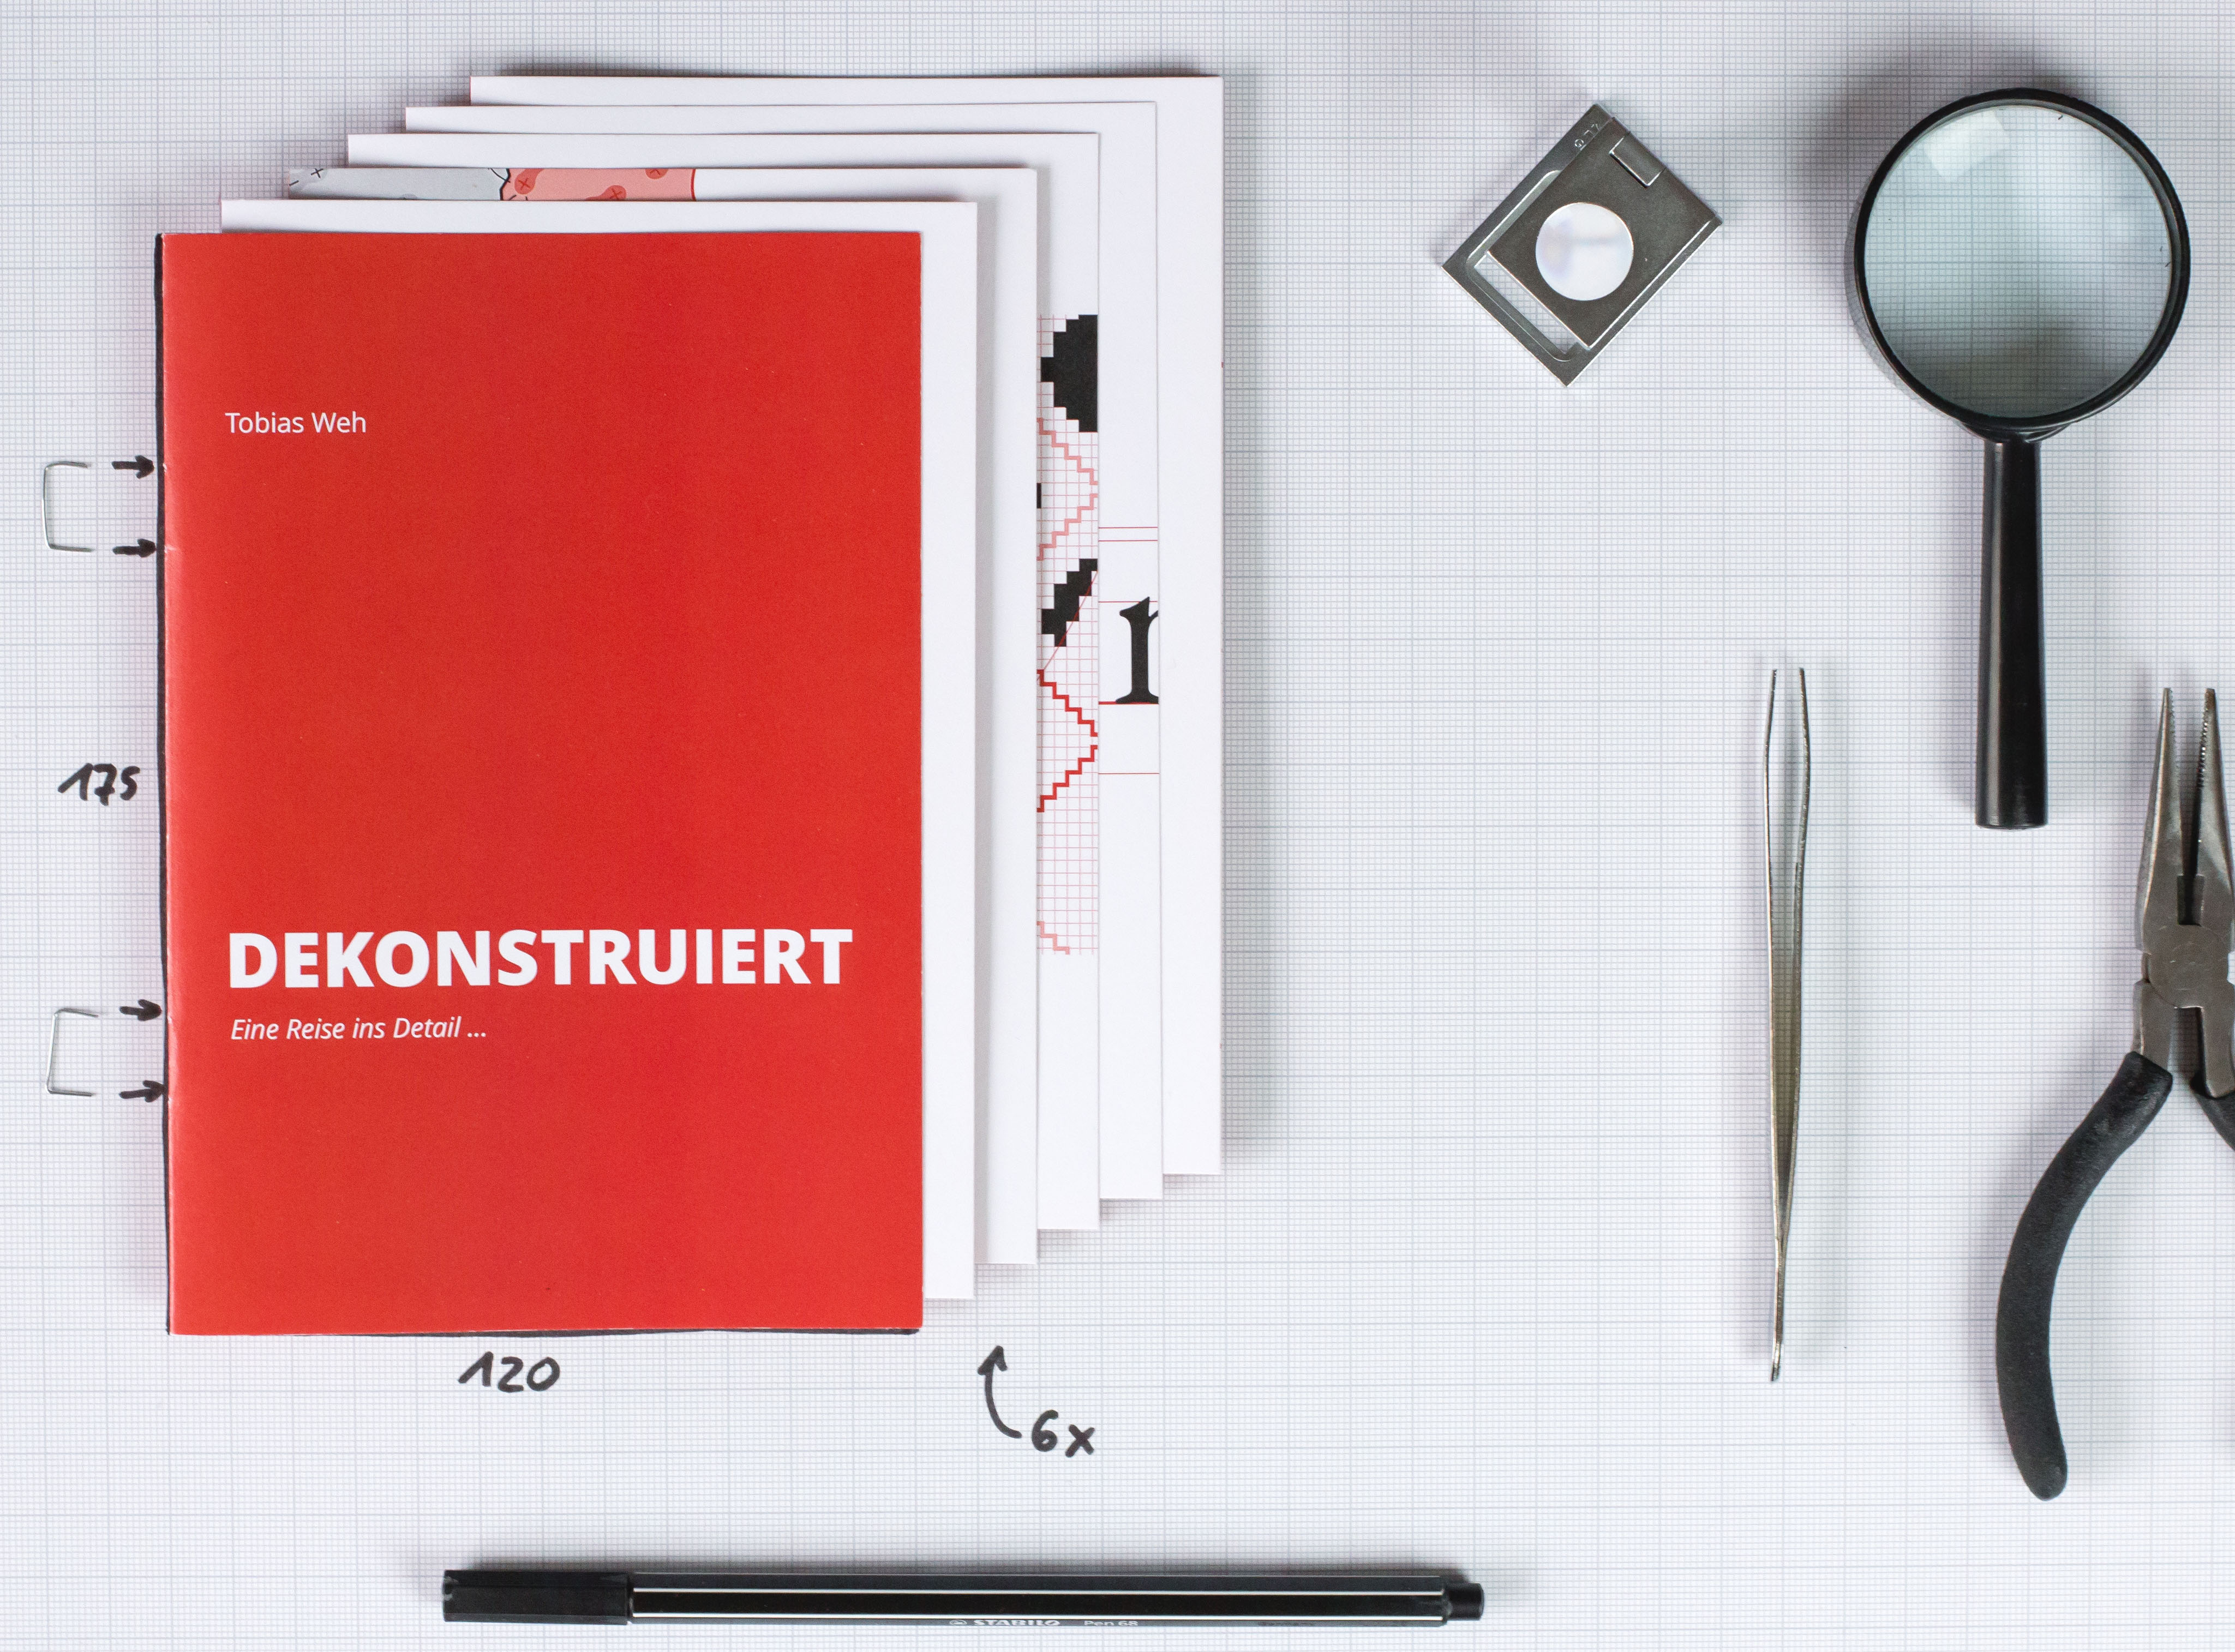 The cover of _Dekonstruiert_.